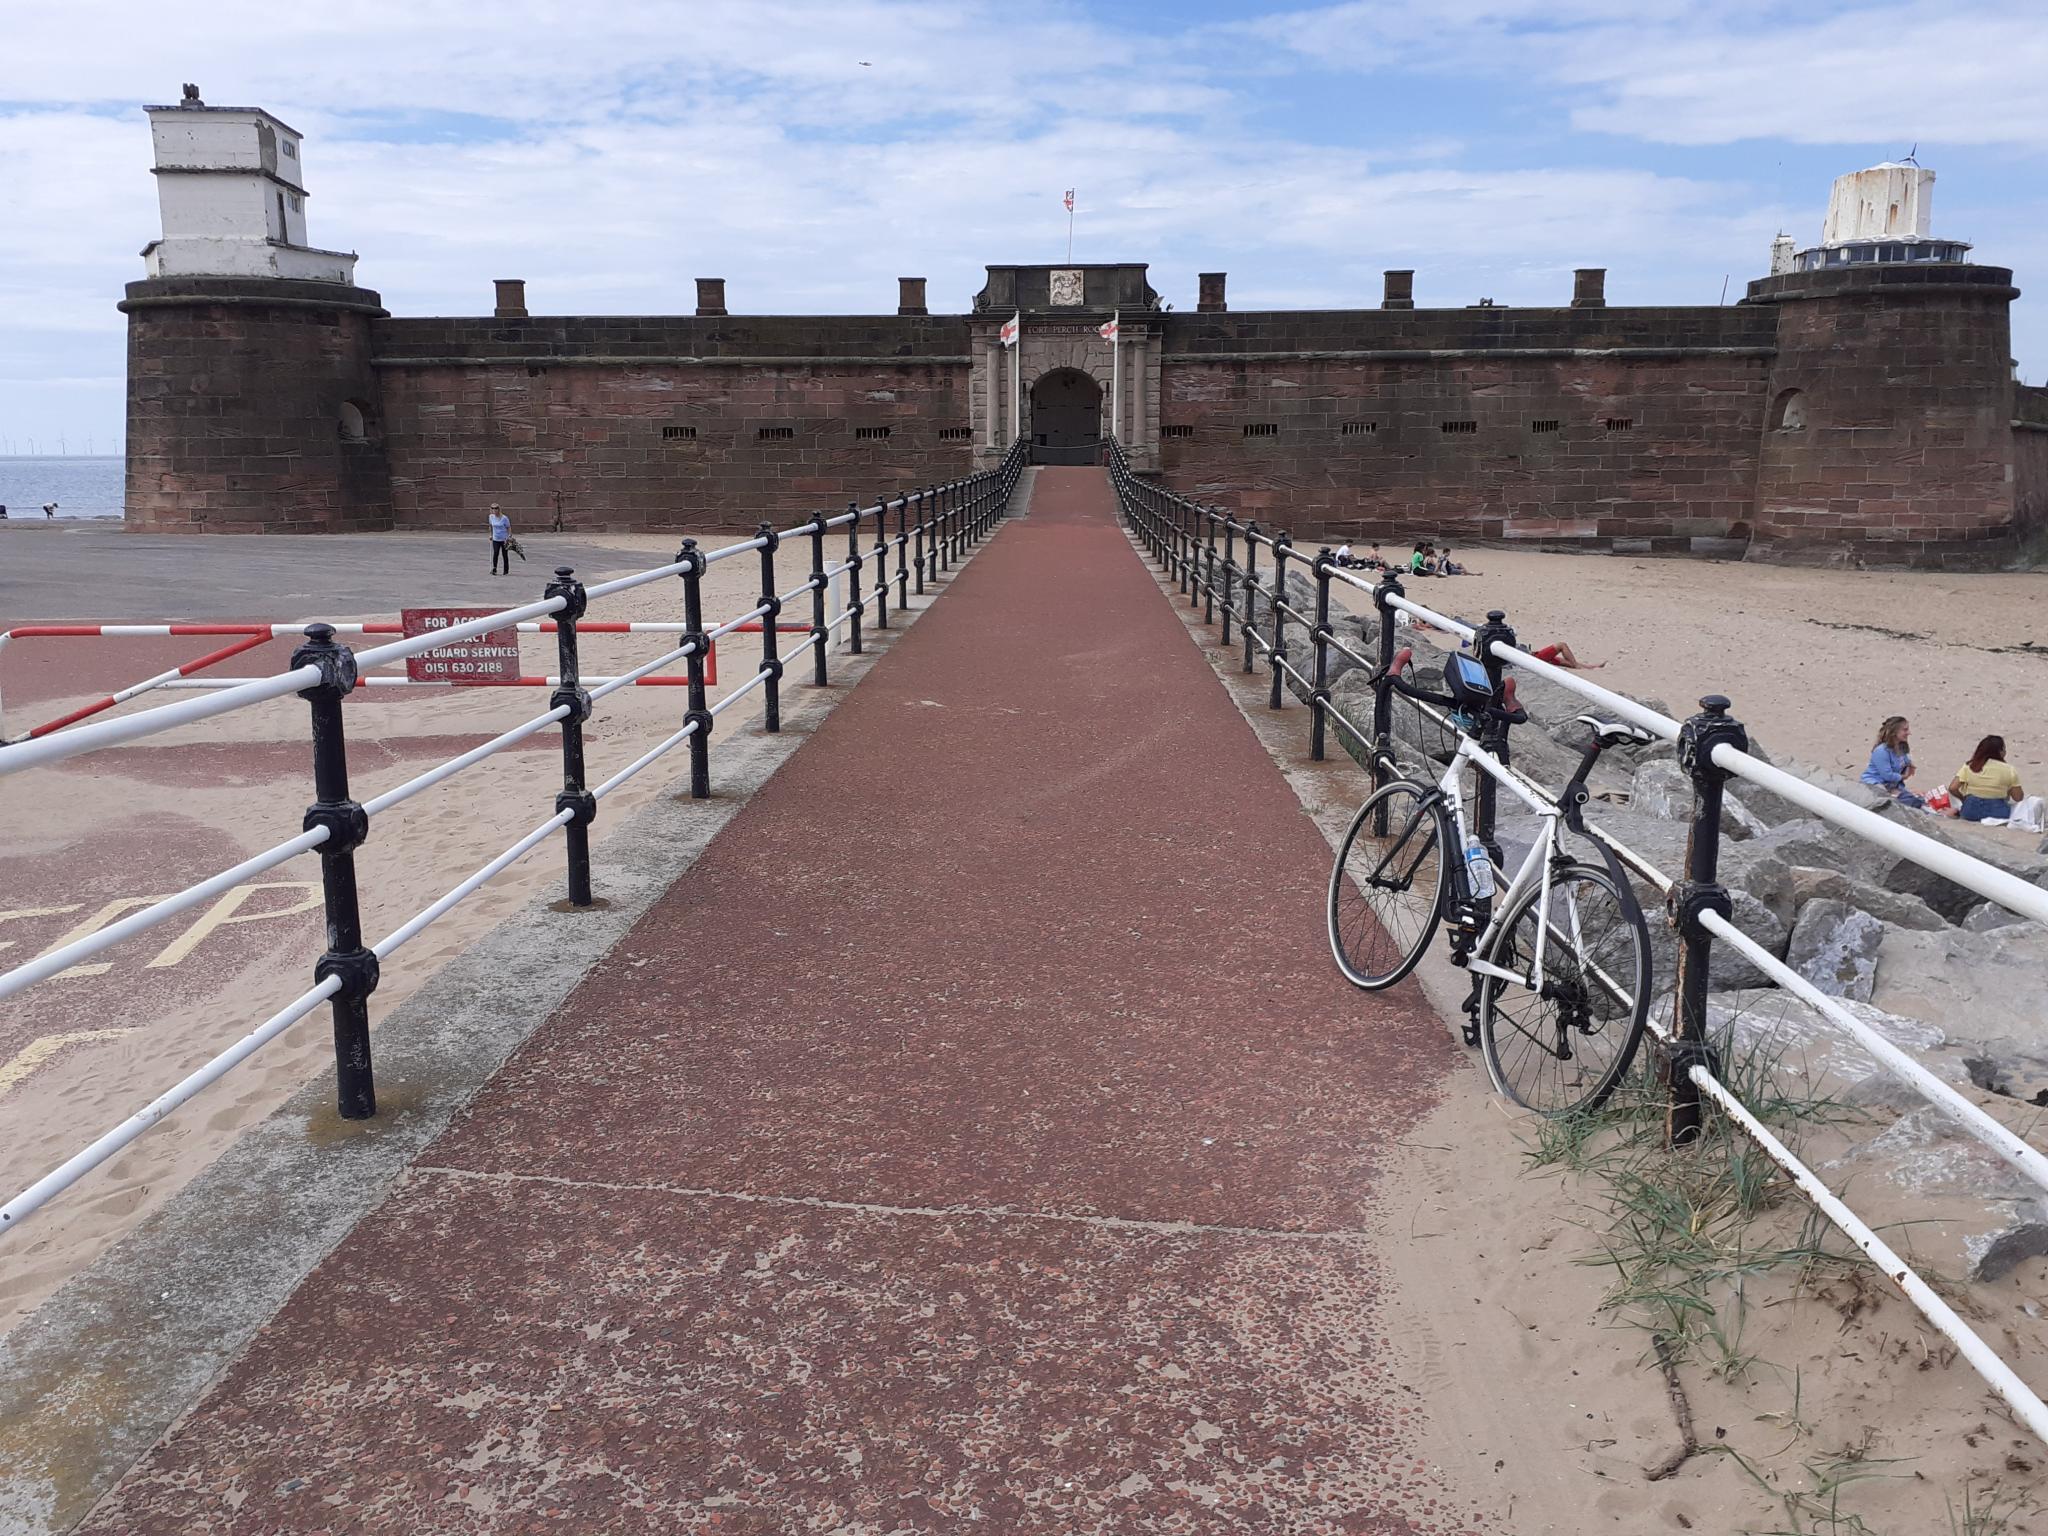 On my bike-20210615_151407-jpg